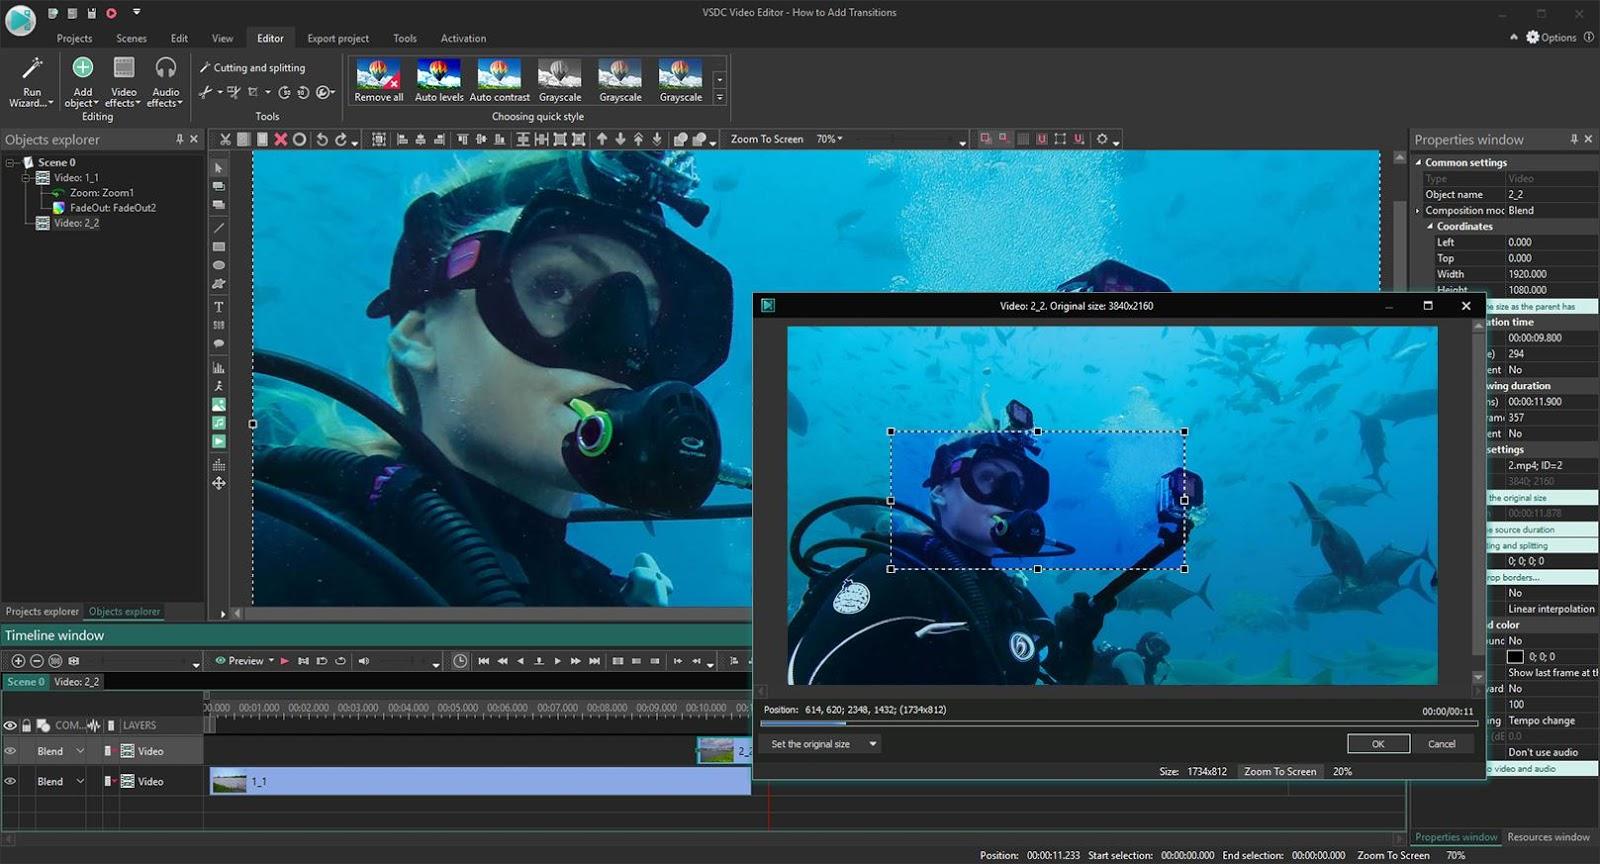 VSDC Free Video Editor 6.3.5.10